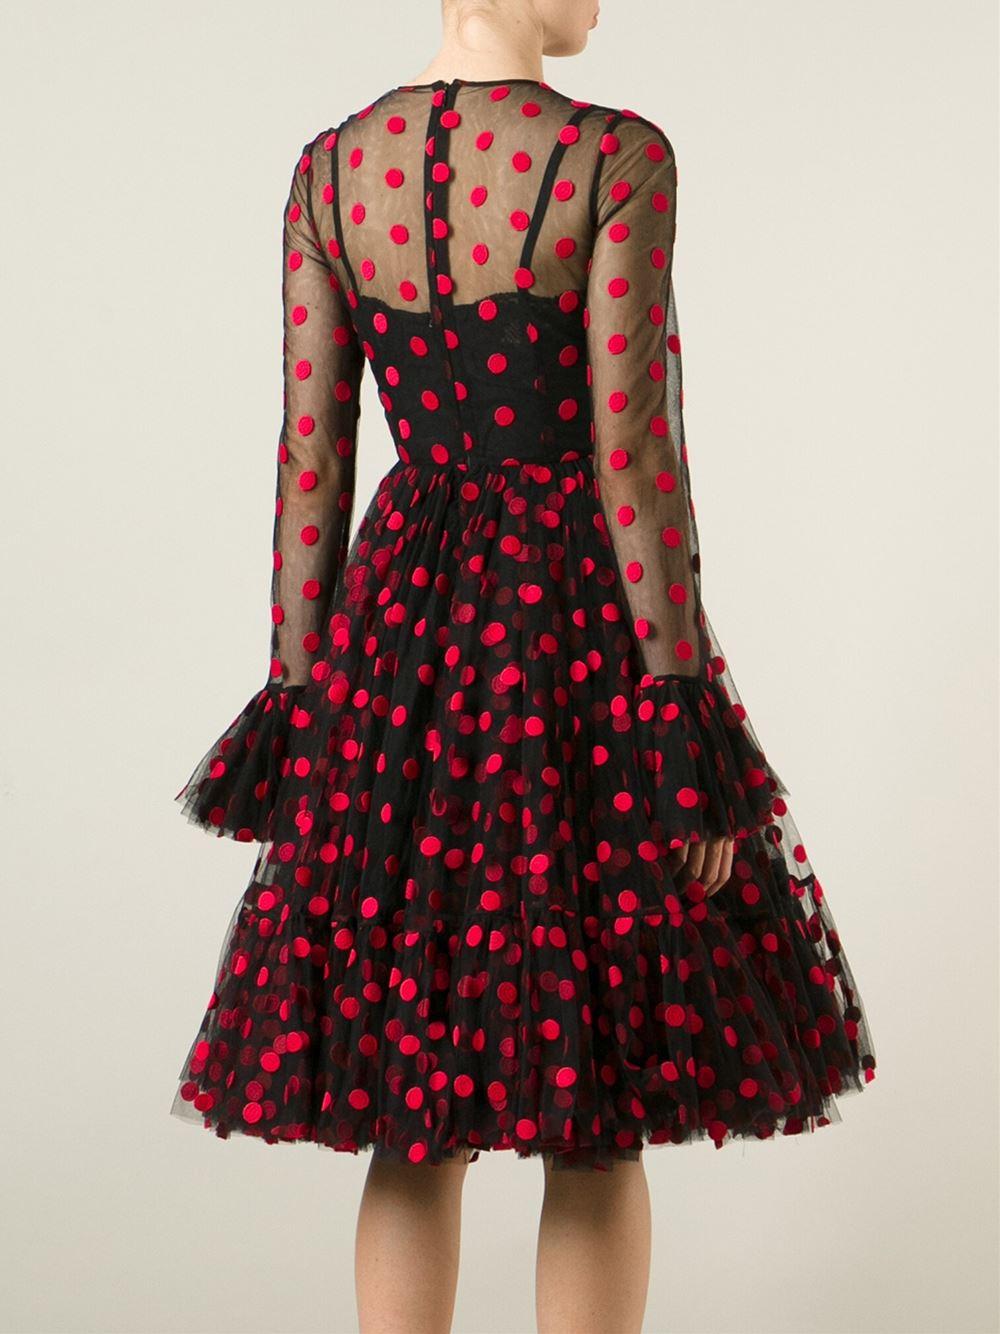 Dolce Amp Gabbana Polka Dot Ruffled Dress In Black Lyst